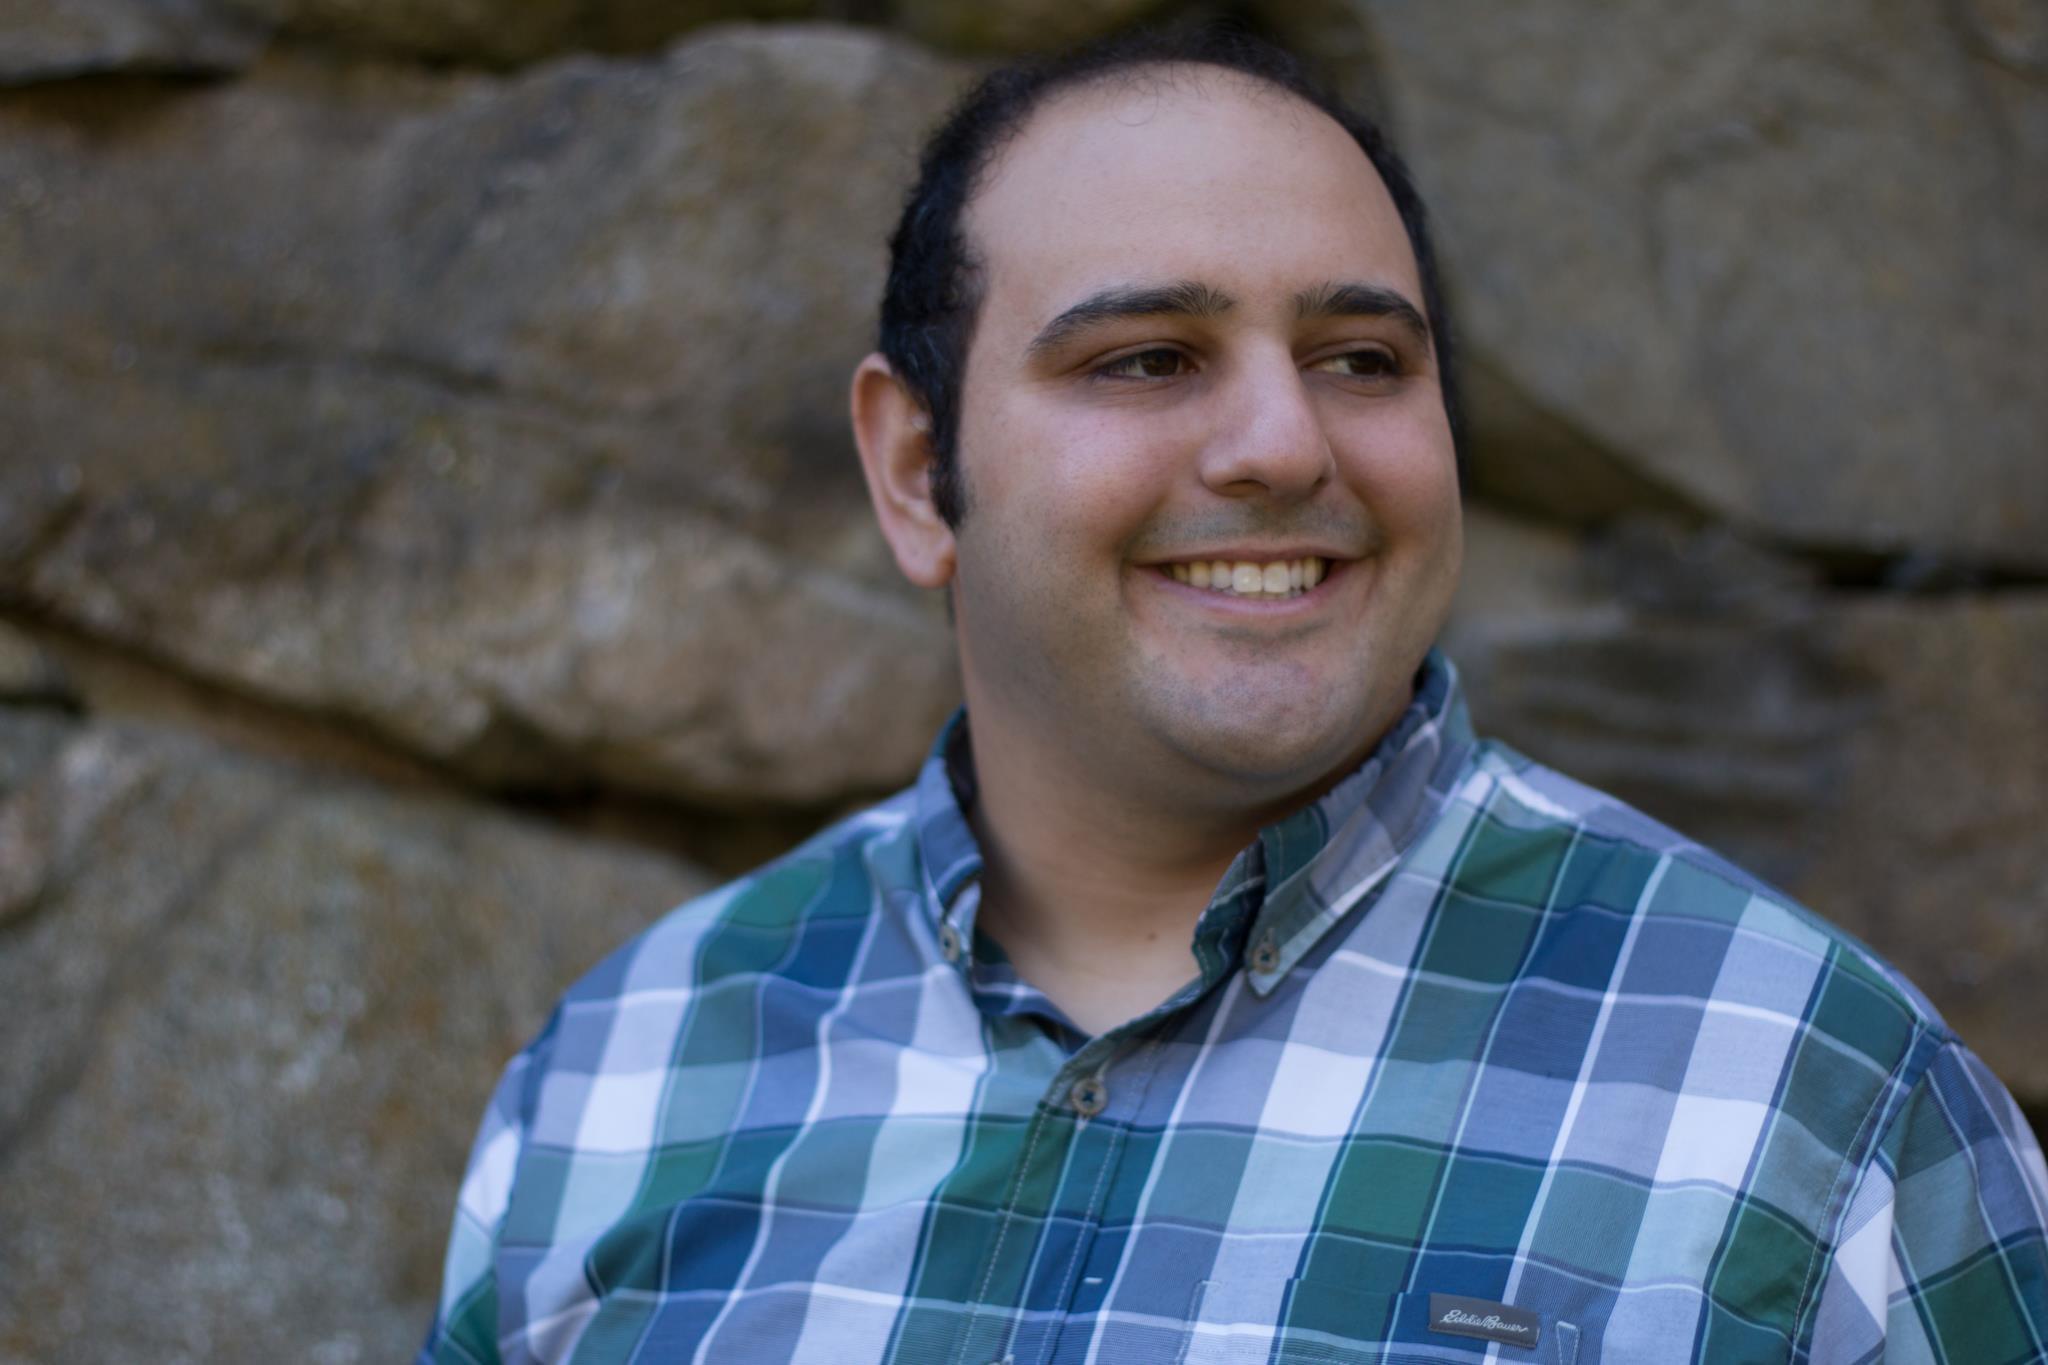 Go to Sam Haddad's profile